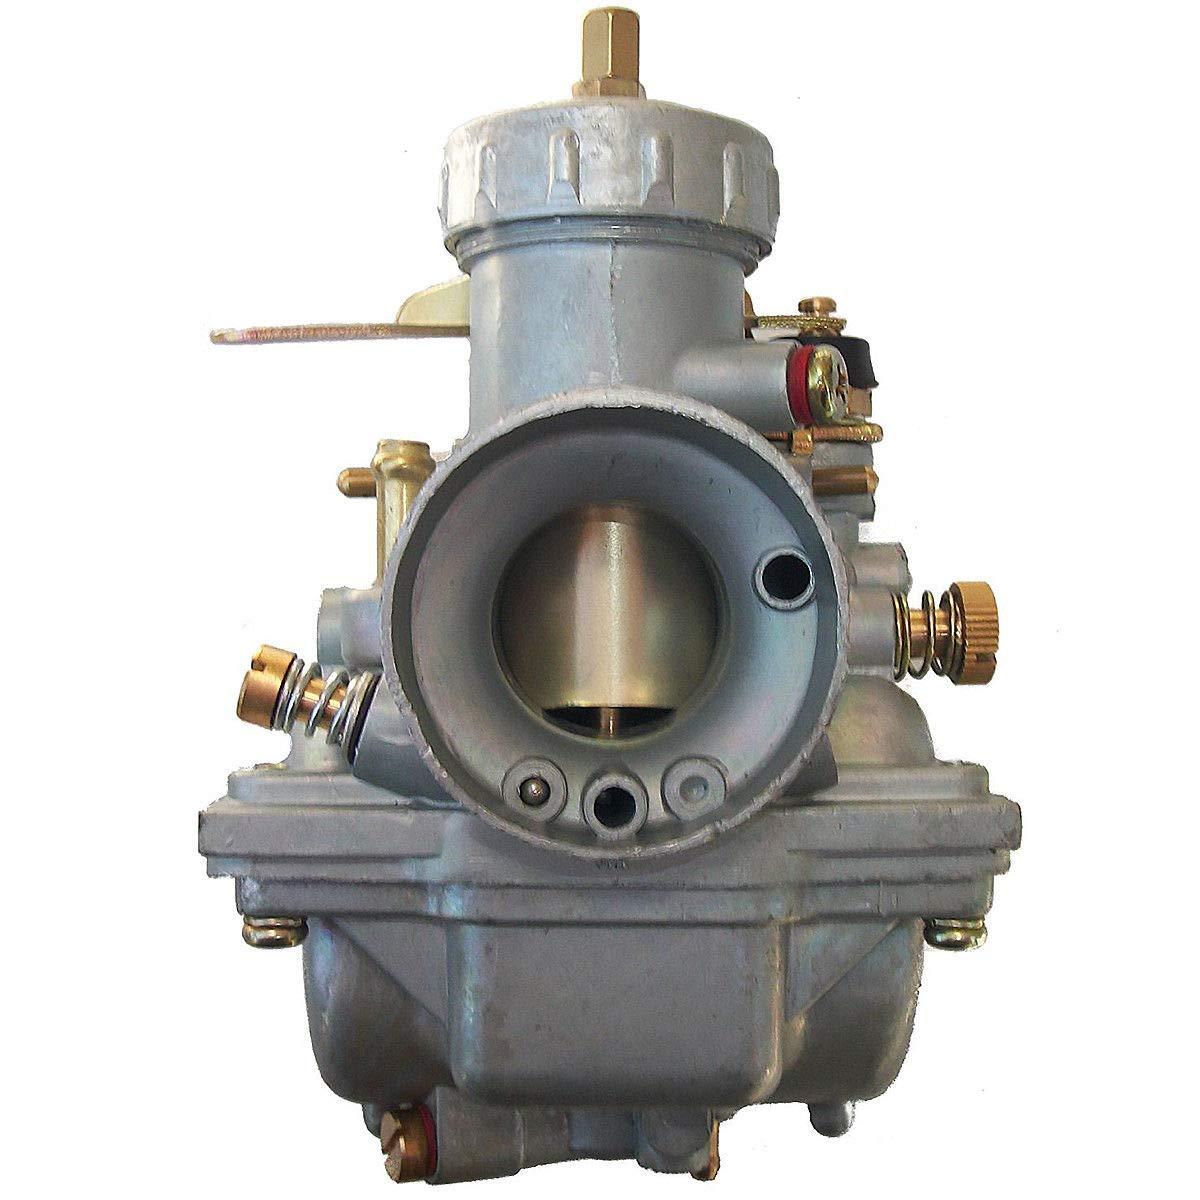 ORIPO Carburetor for Yamaha 360 RT1 RT2 RT3 RT1MX